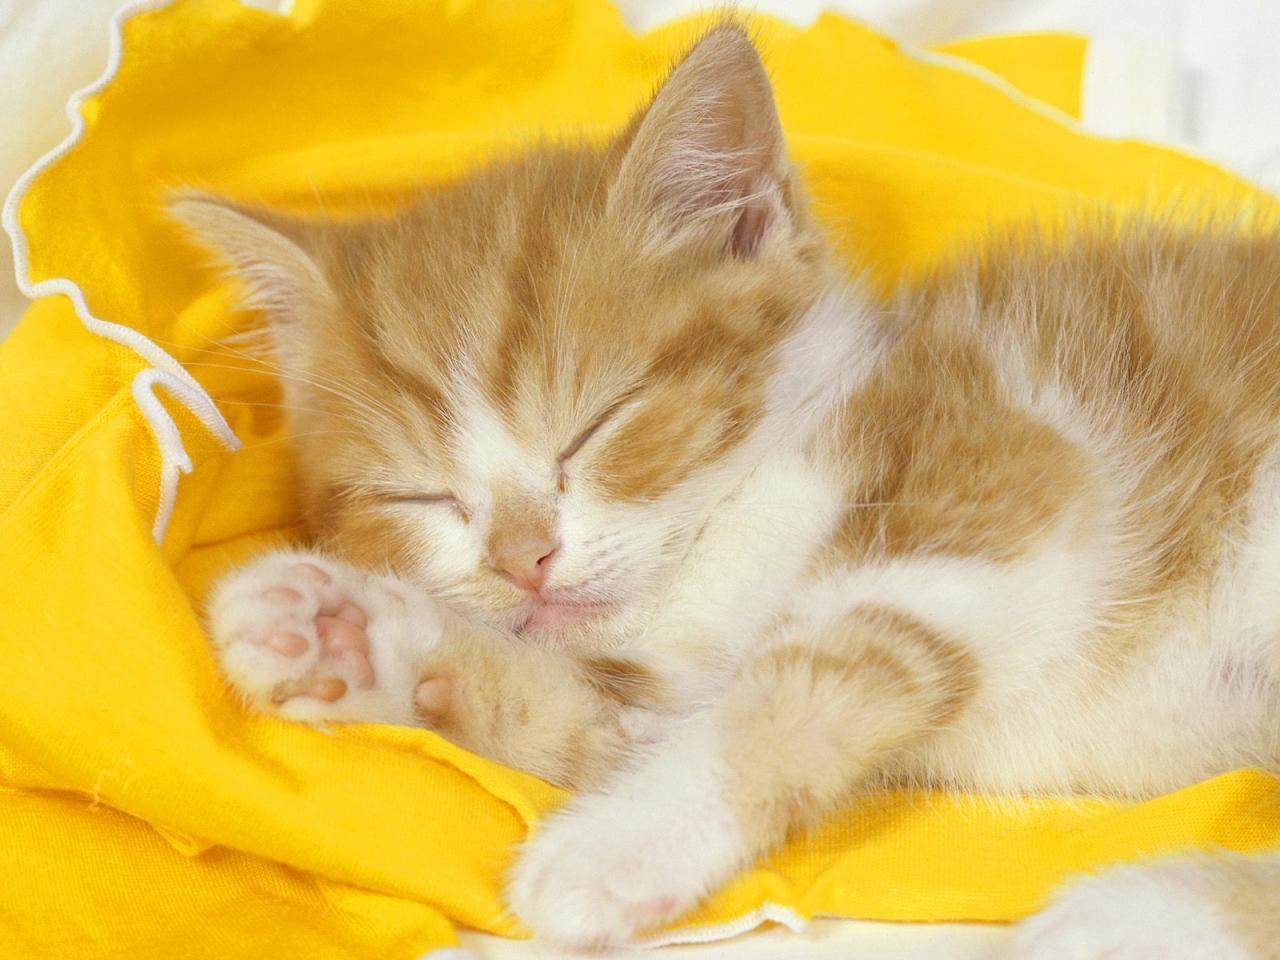 خلفيات قطط كيوت جدا 6